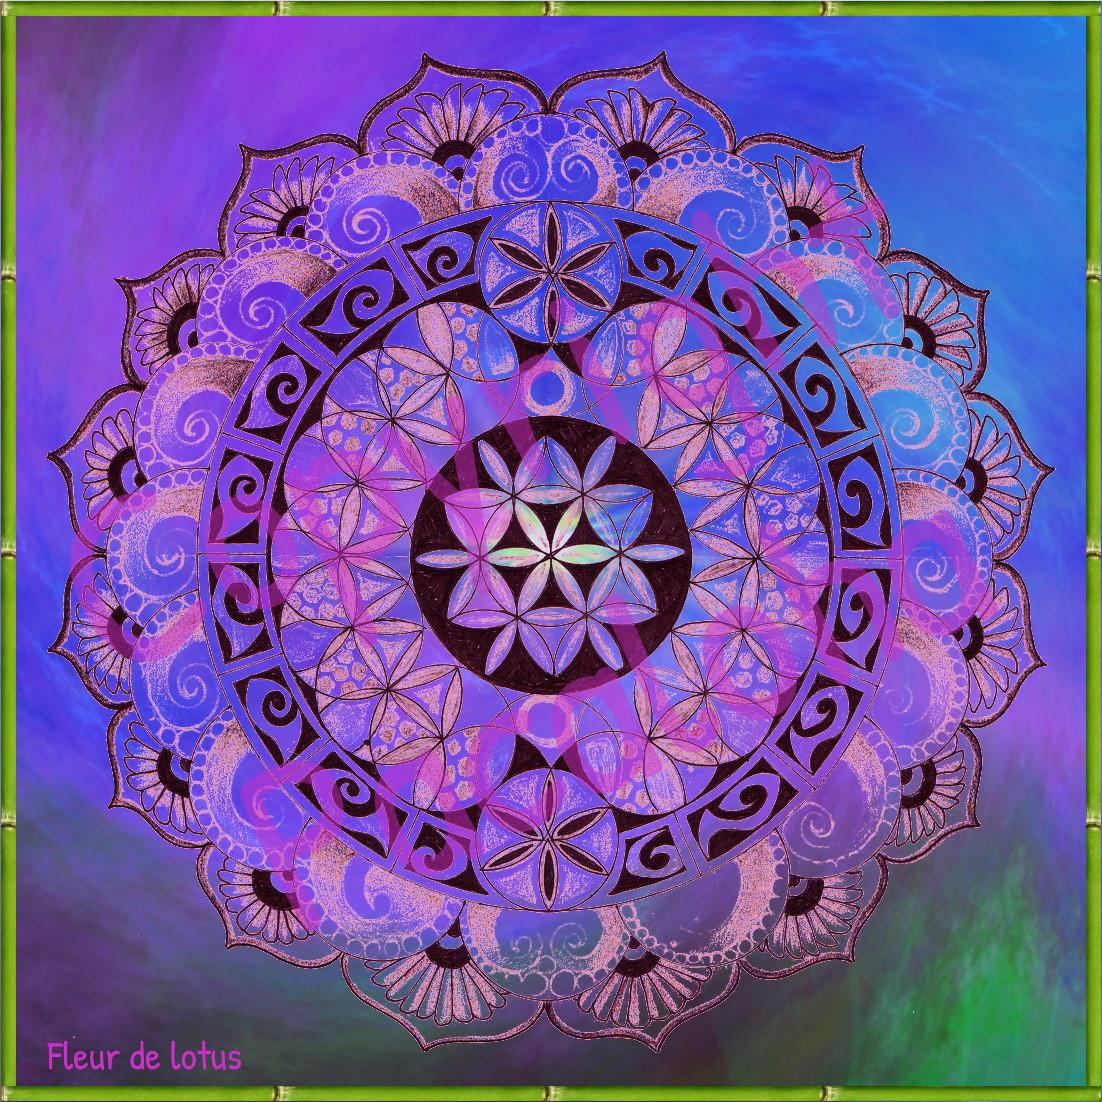 Cartes Symbole Fleur De Lotus